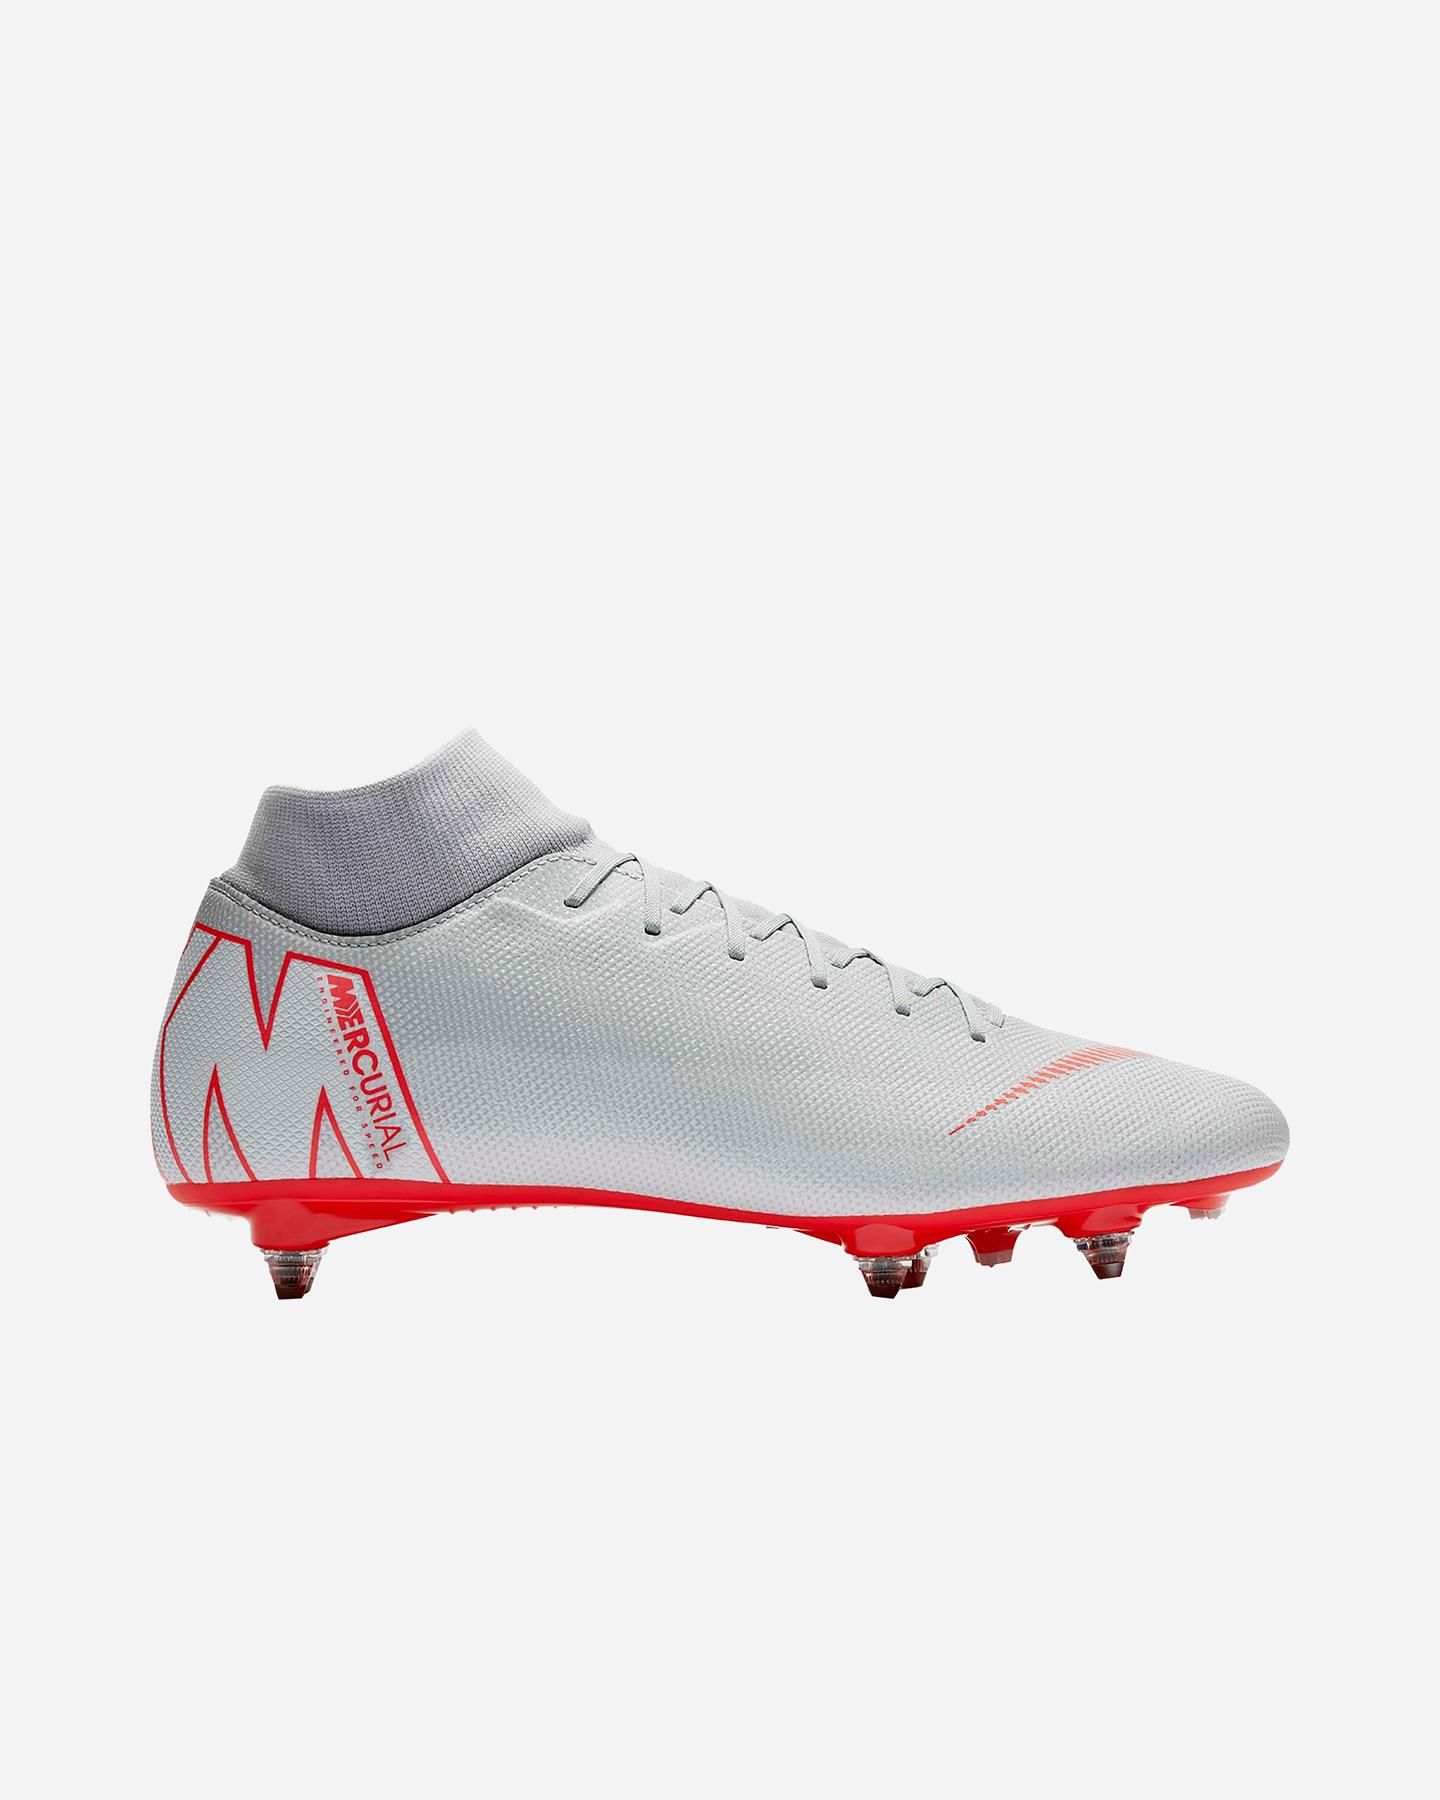 606ddf05118eab Acquista scarpe calcio nike mercurial - OFF50% sconti